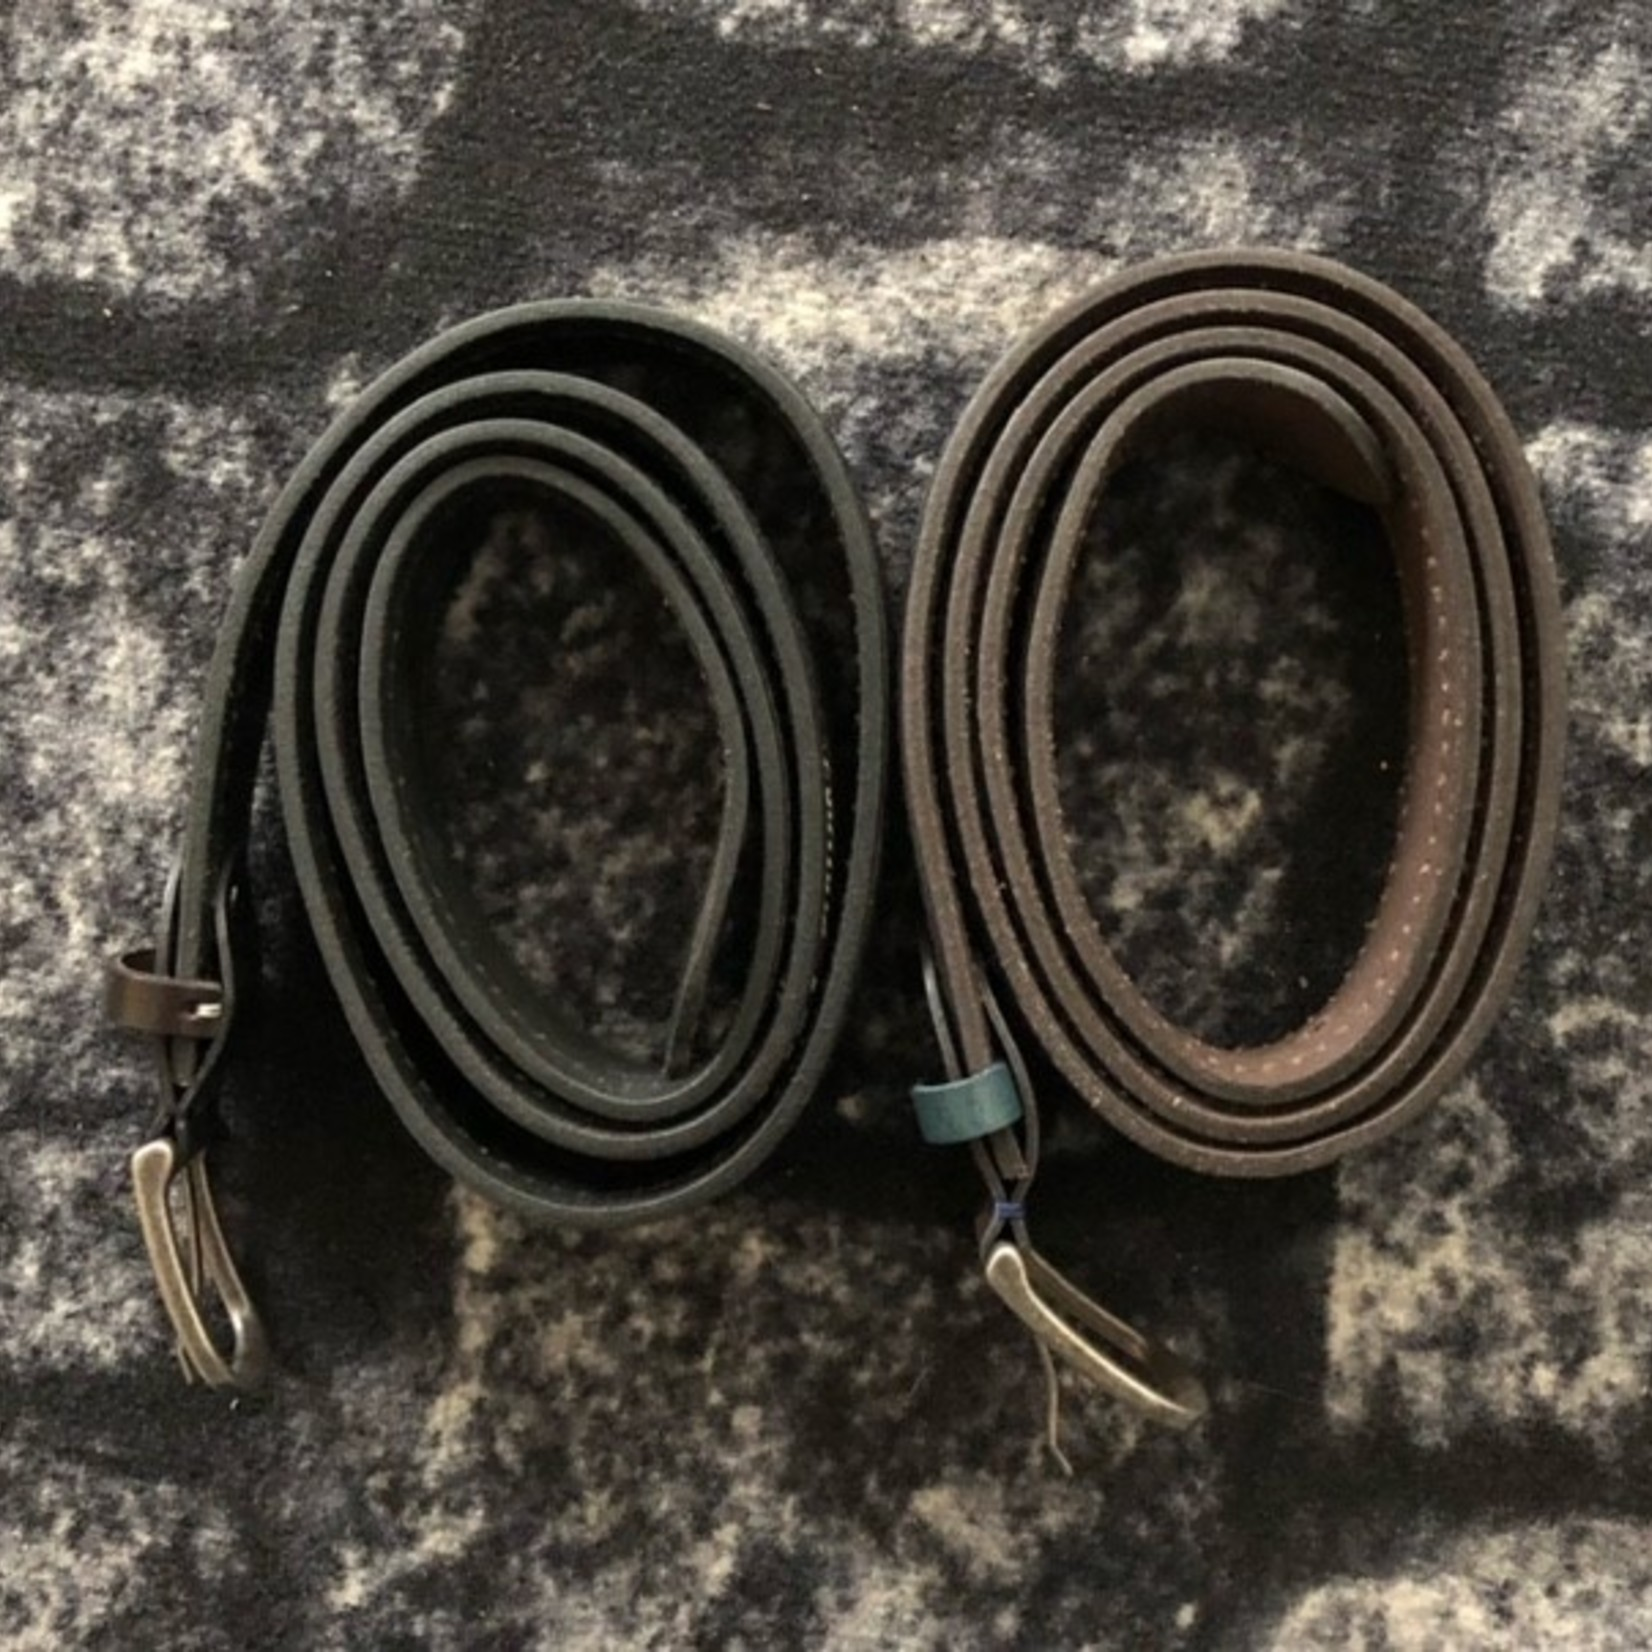 Cycled Supercorsa belt b/z/b